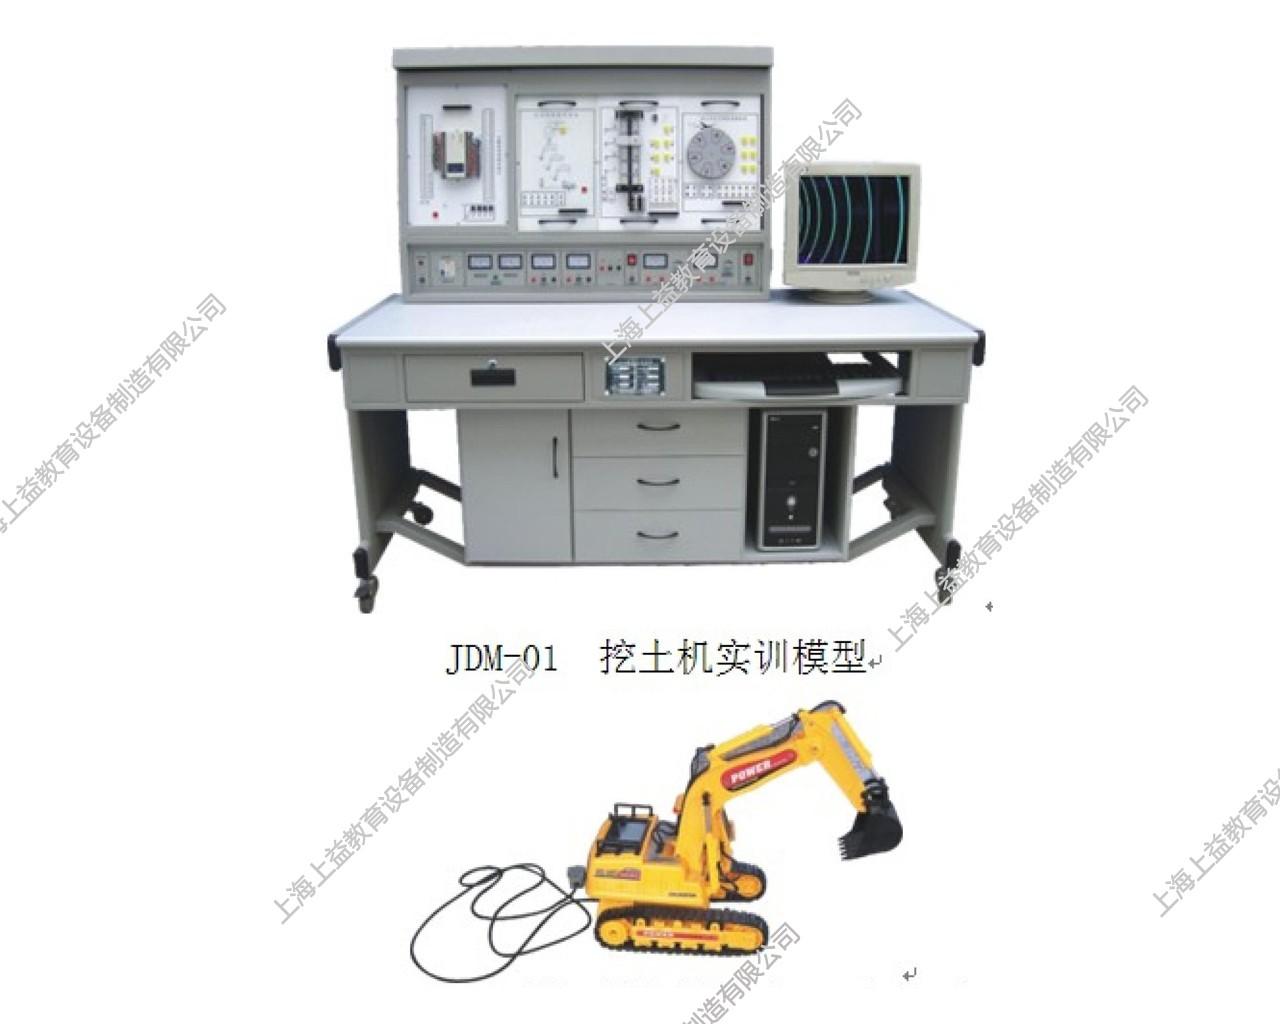 SYPLC-102EPLC可编程控制器、变频调速综合实验装置(网络型)